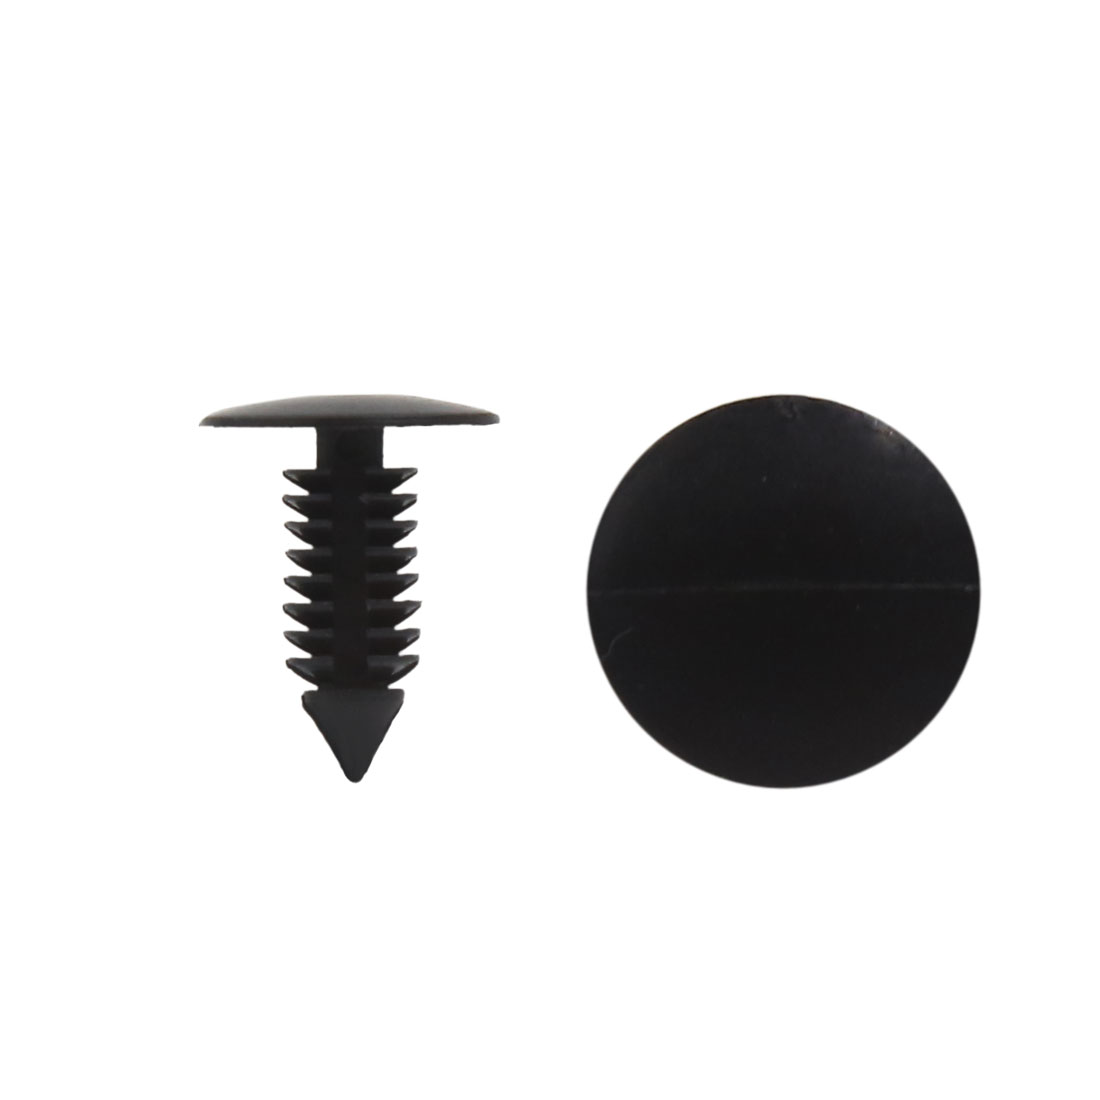 30 Pcs 8mm Dia Hole Black Plastic Rivets Fasteners for Car Auto Bumper Fender